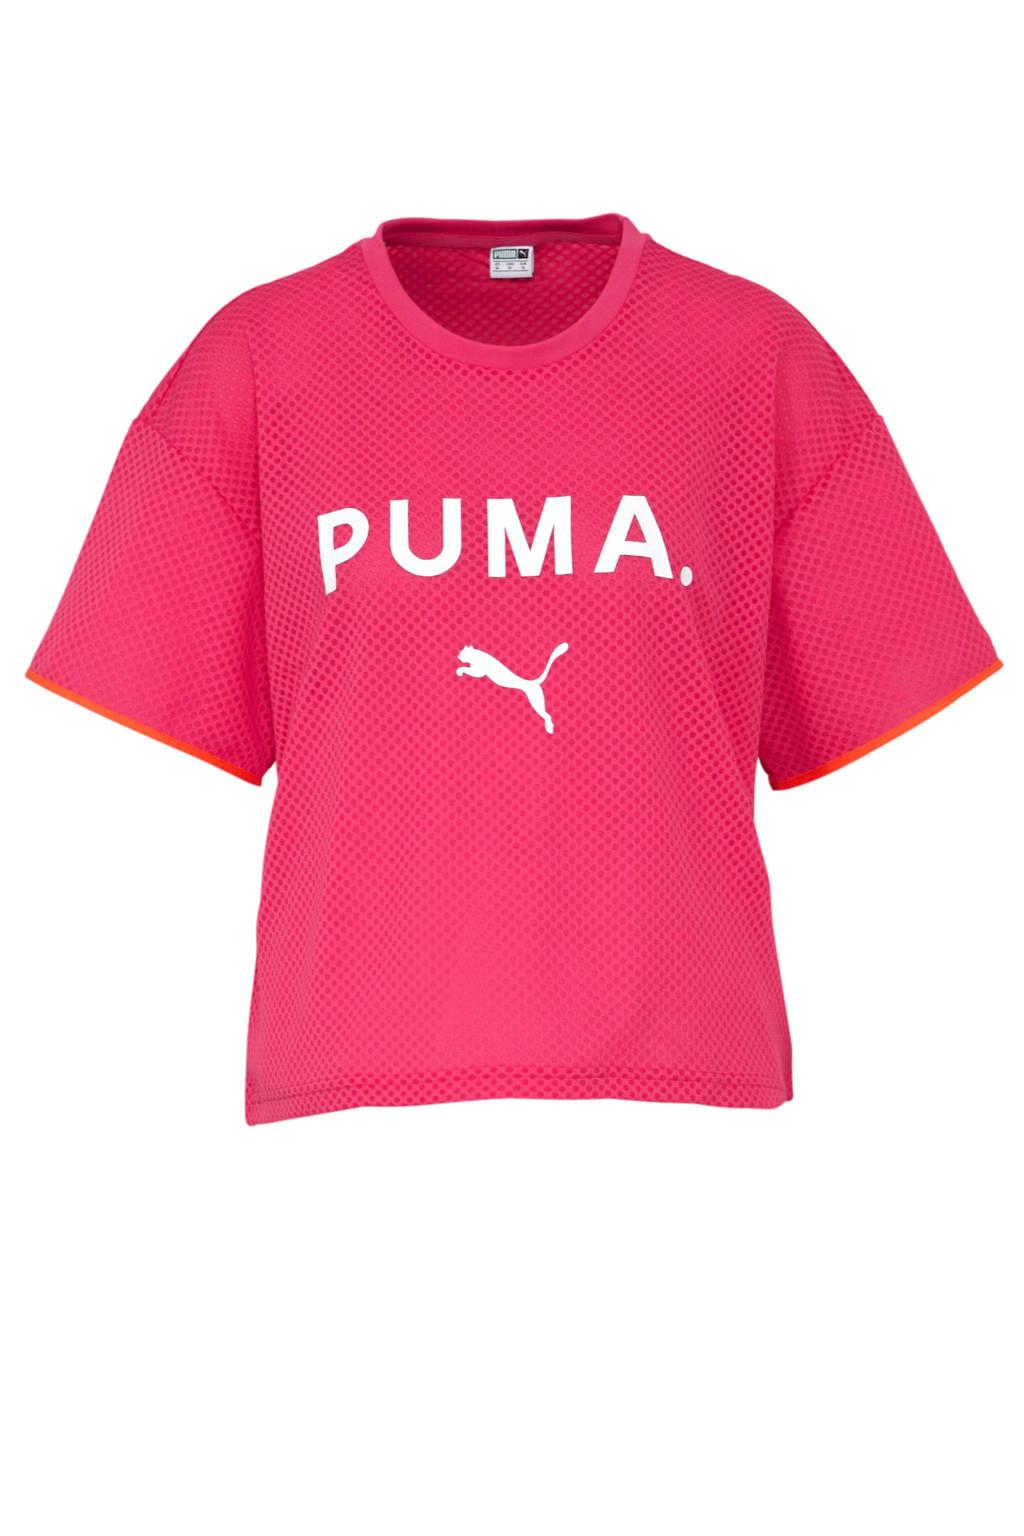 Puma T-shirt met printopdruk roze/paars, Roze/paars